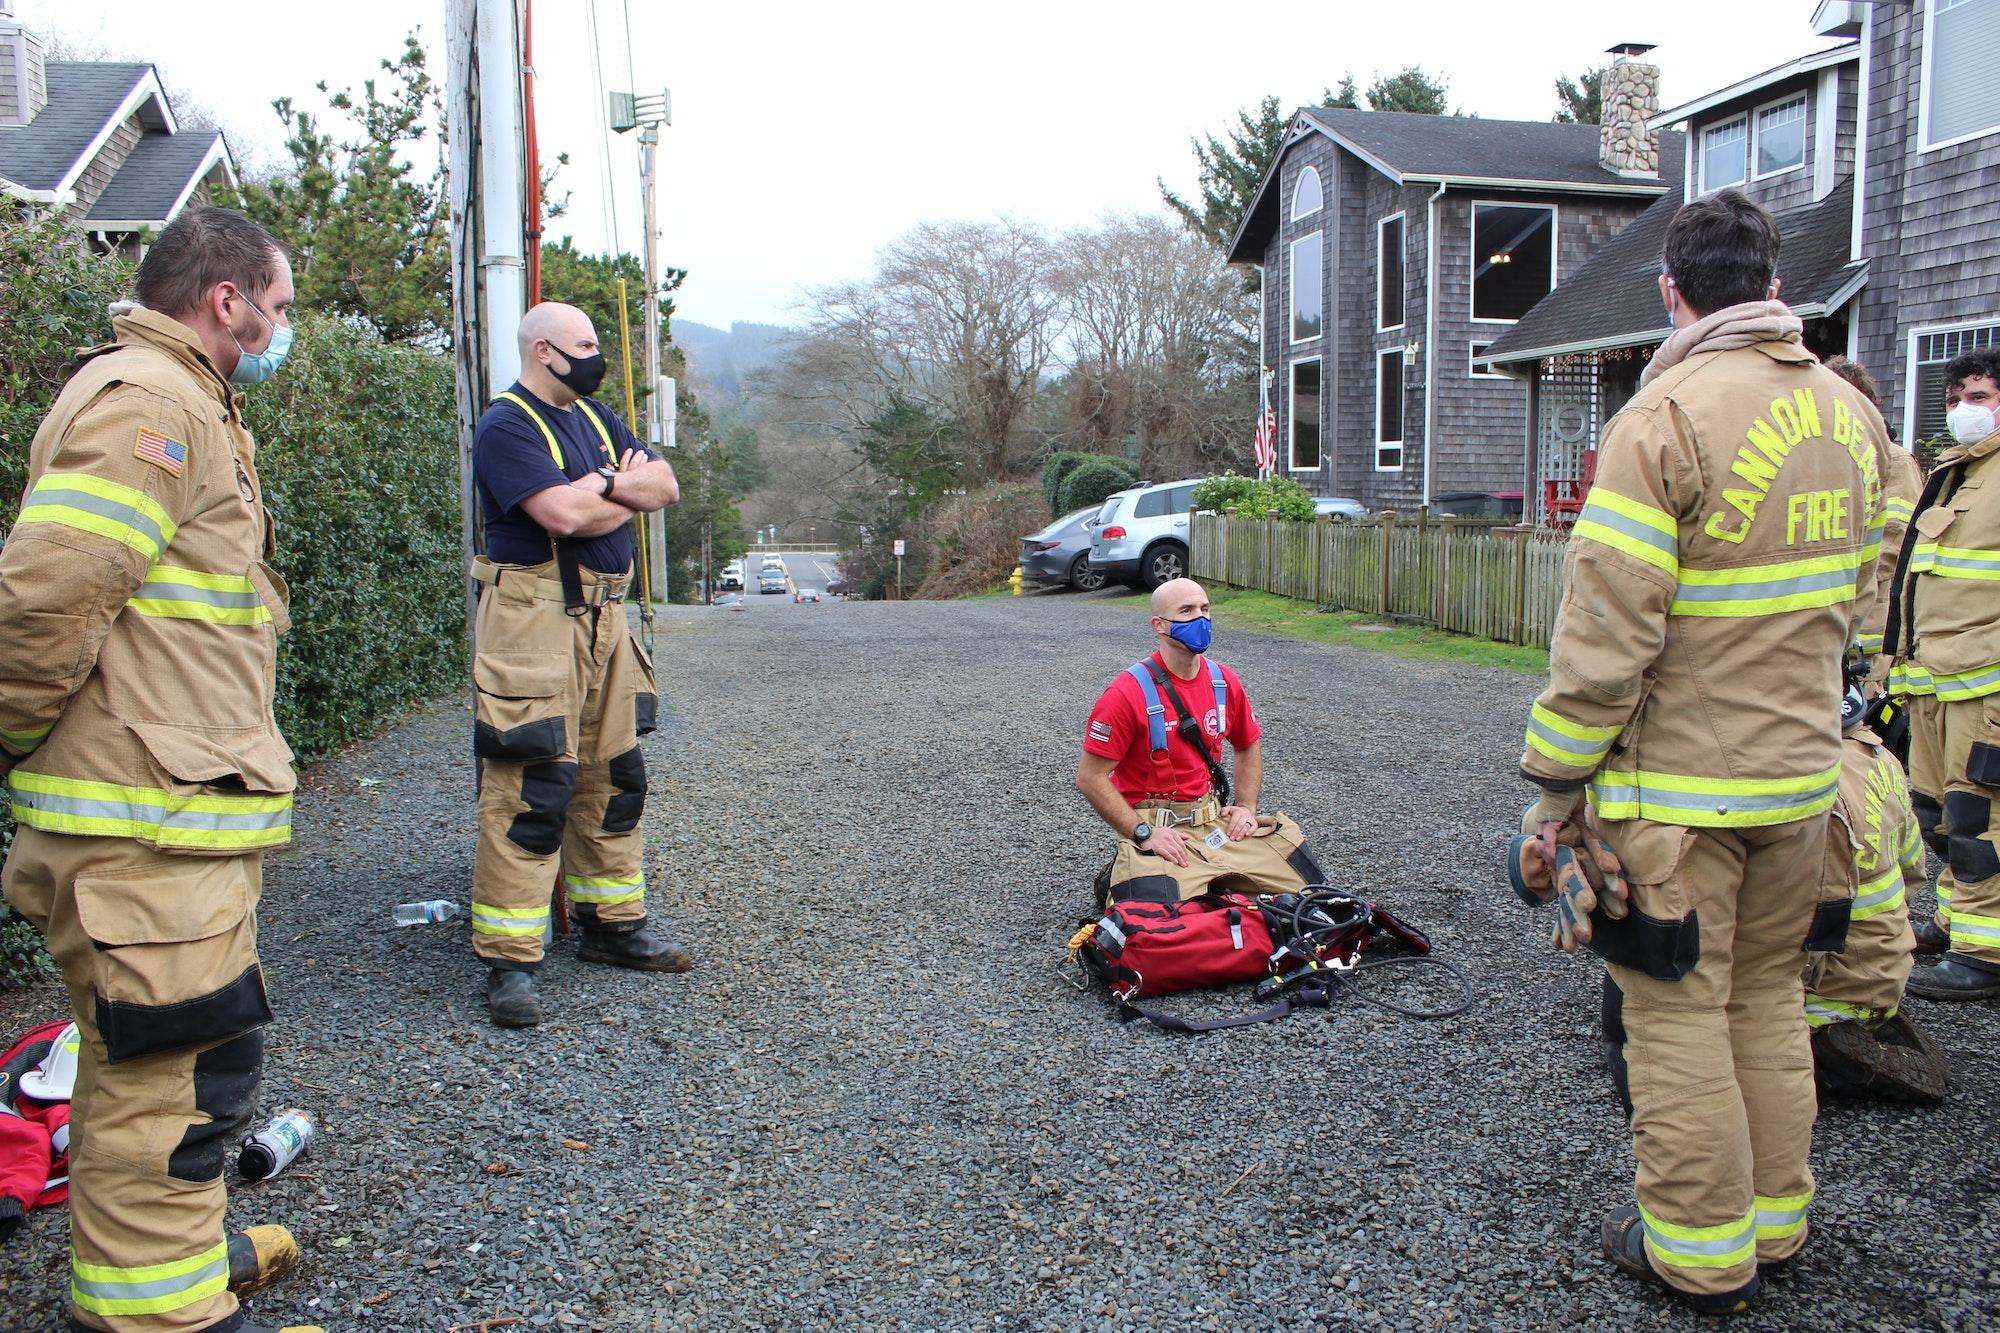 May contain: person, human, tarmac, asphalt, shoe, clothing, footwear, apparel, fireman, and road